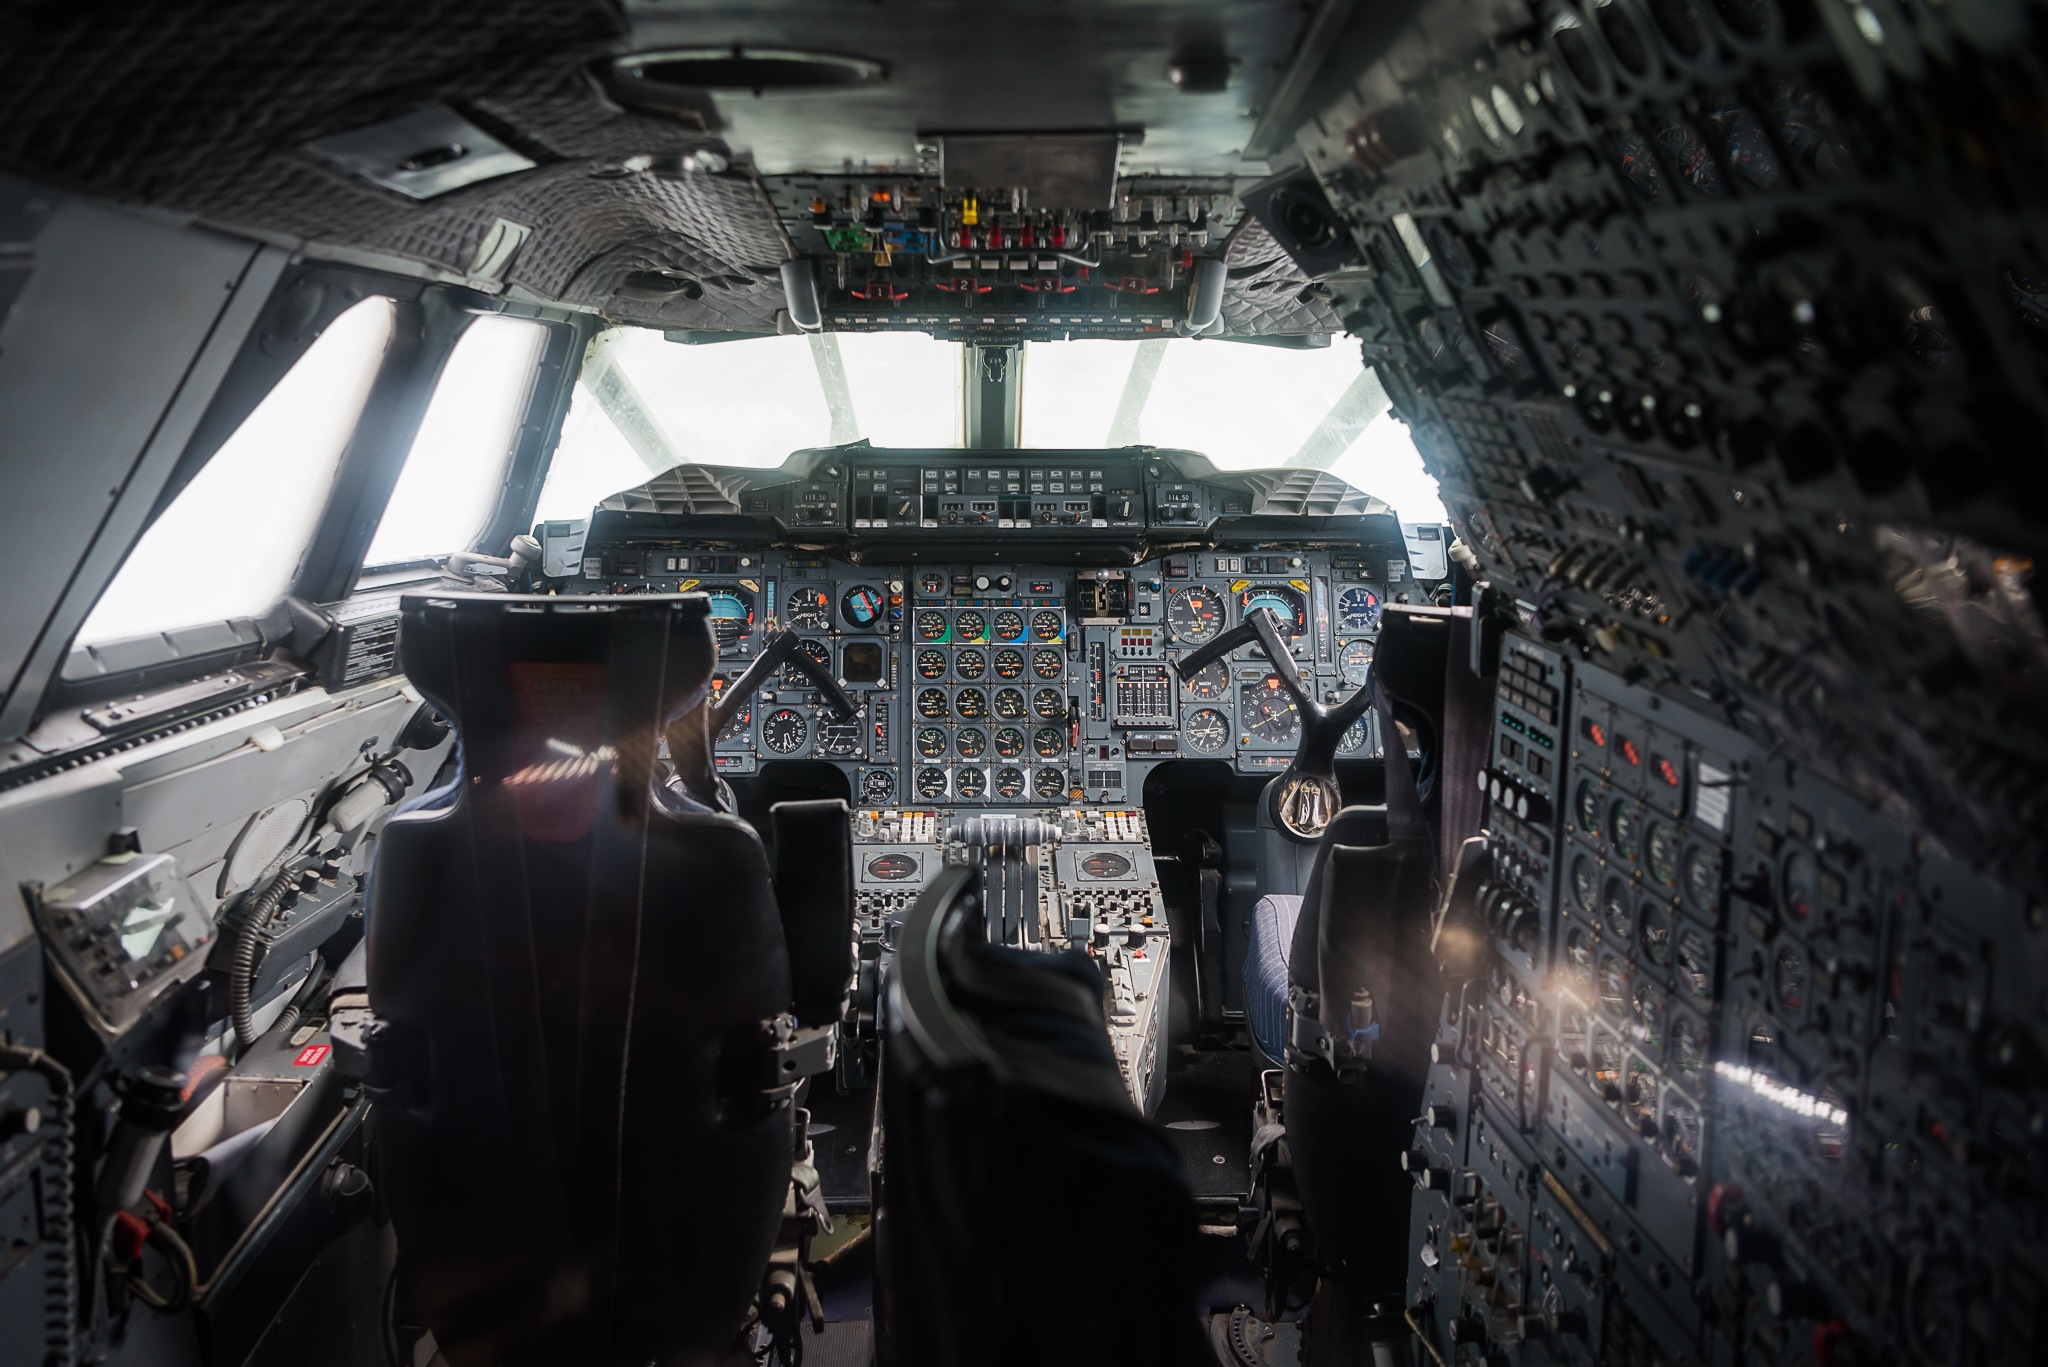 The Cockpit of Concorde  by Safta Ciprian